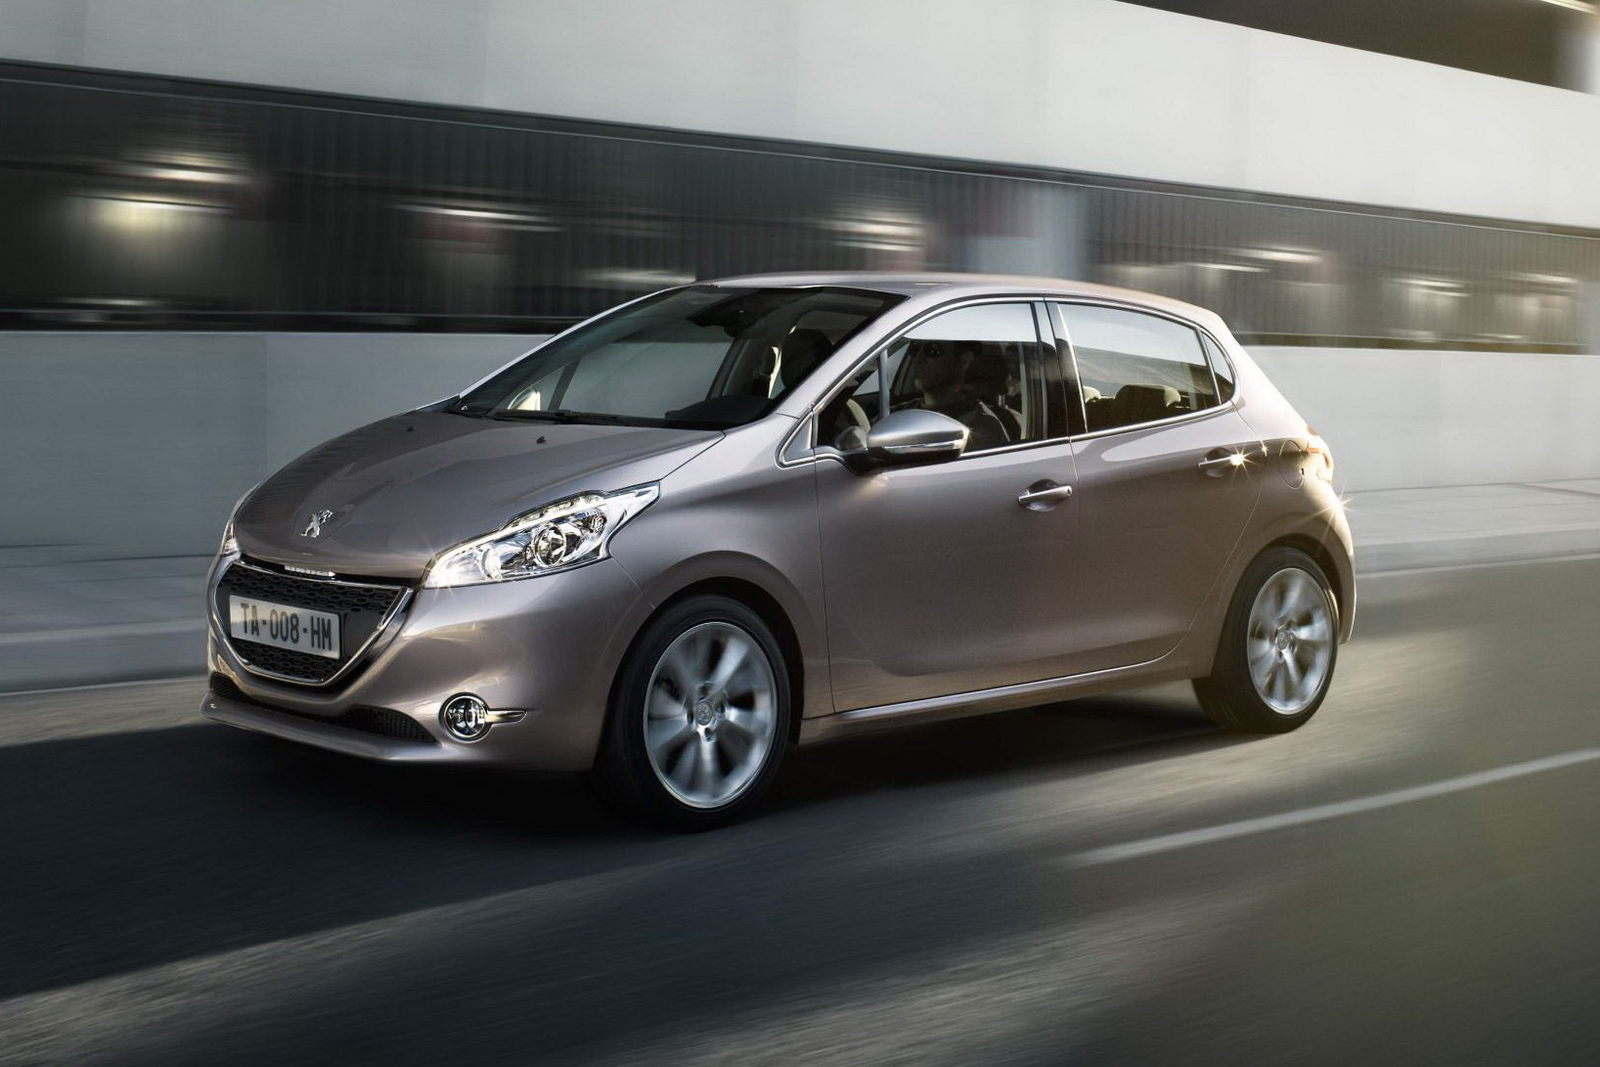 Novo Peugeot 208 2017 - Preço, Consumo, Ficha Técnica, Fotos